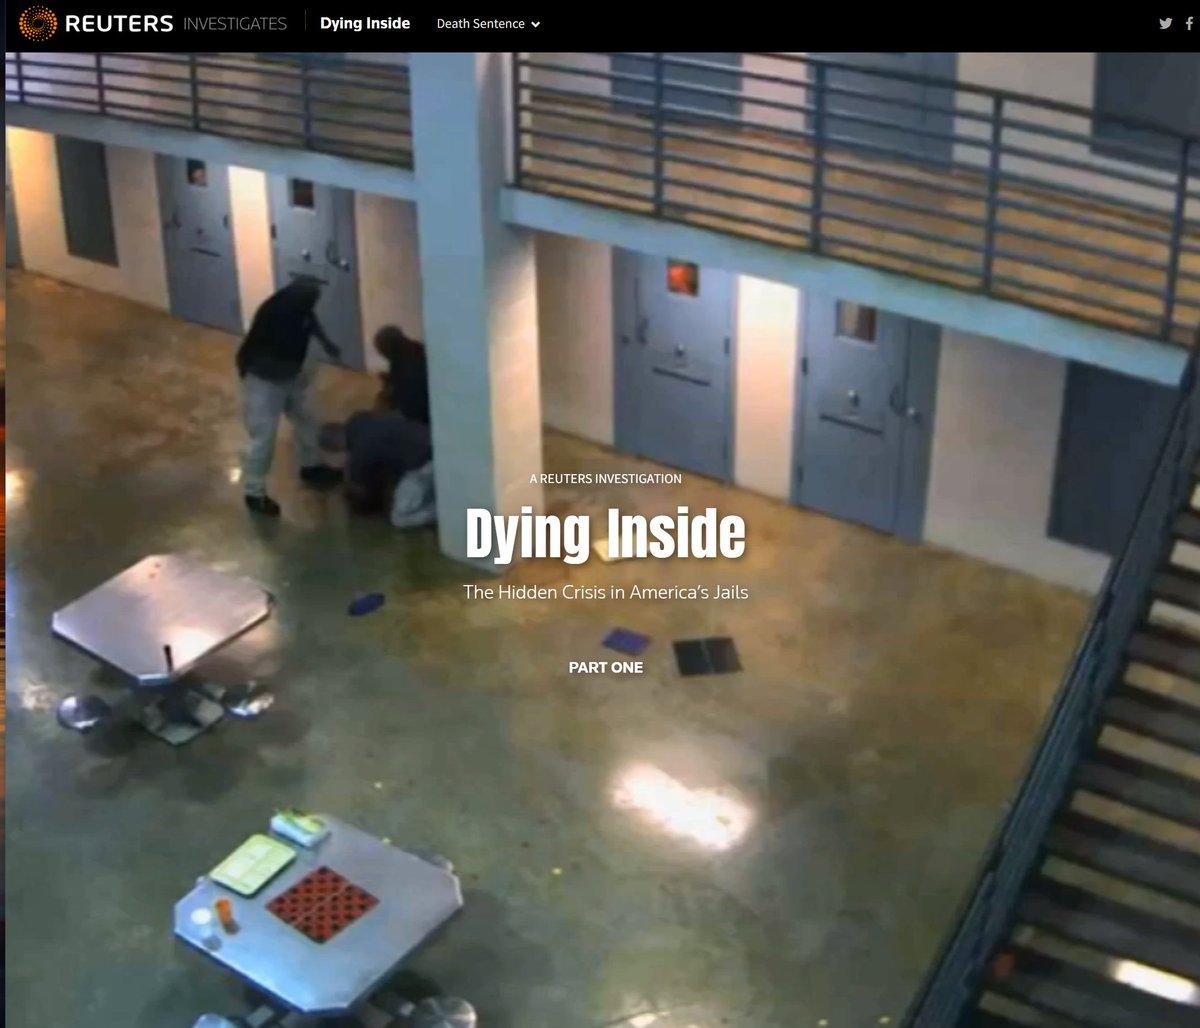 When minor crime becomes a death sentence – @Reuters investigates America's local jails  @byPeterEisler @LindaSoReports @grantmeaccess @jasonszep @nedmparker1